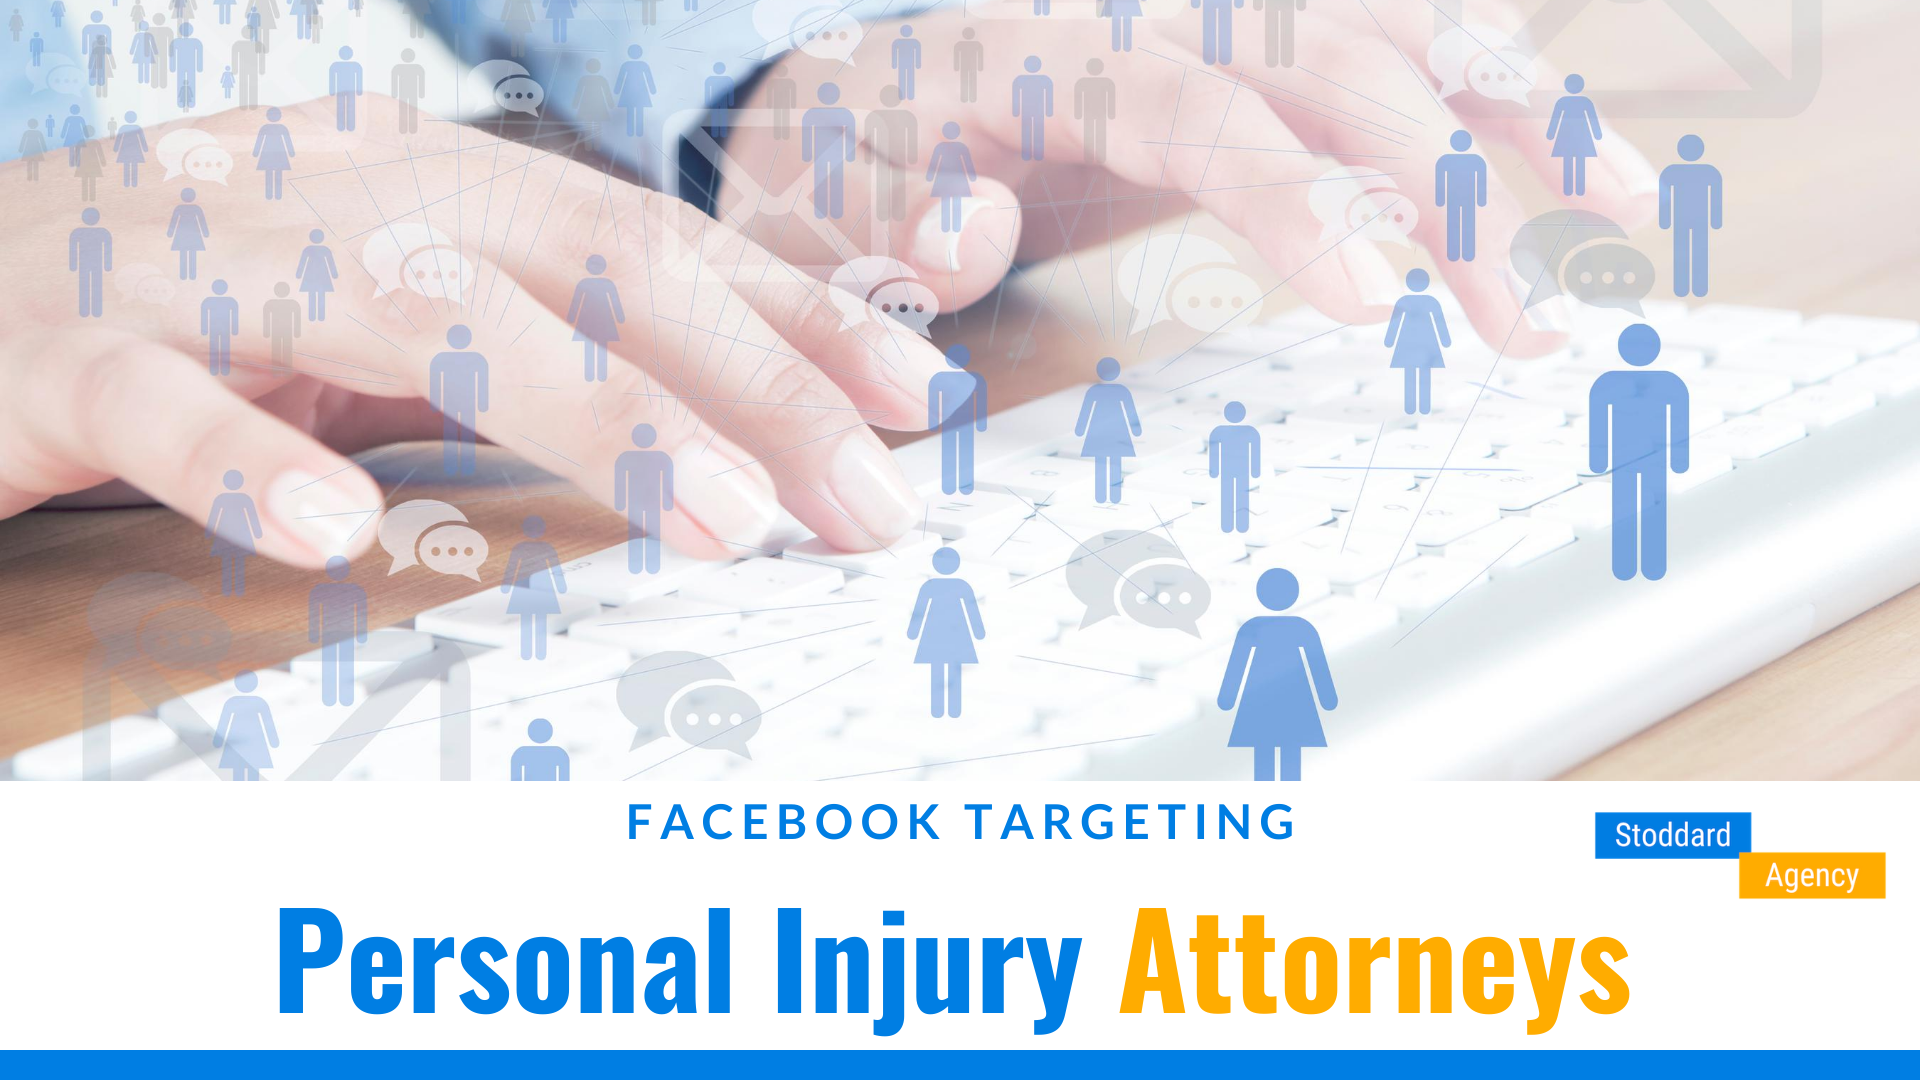 Facebook Targeting Personal Injury Attorney